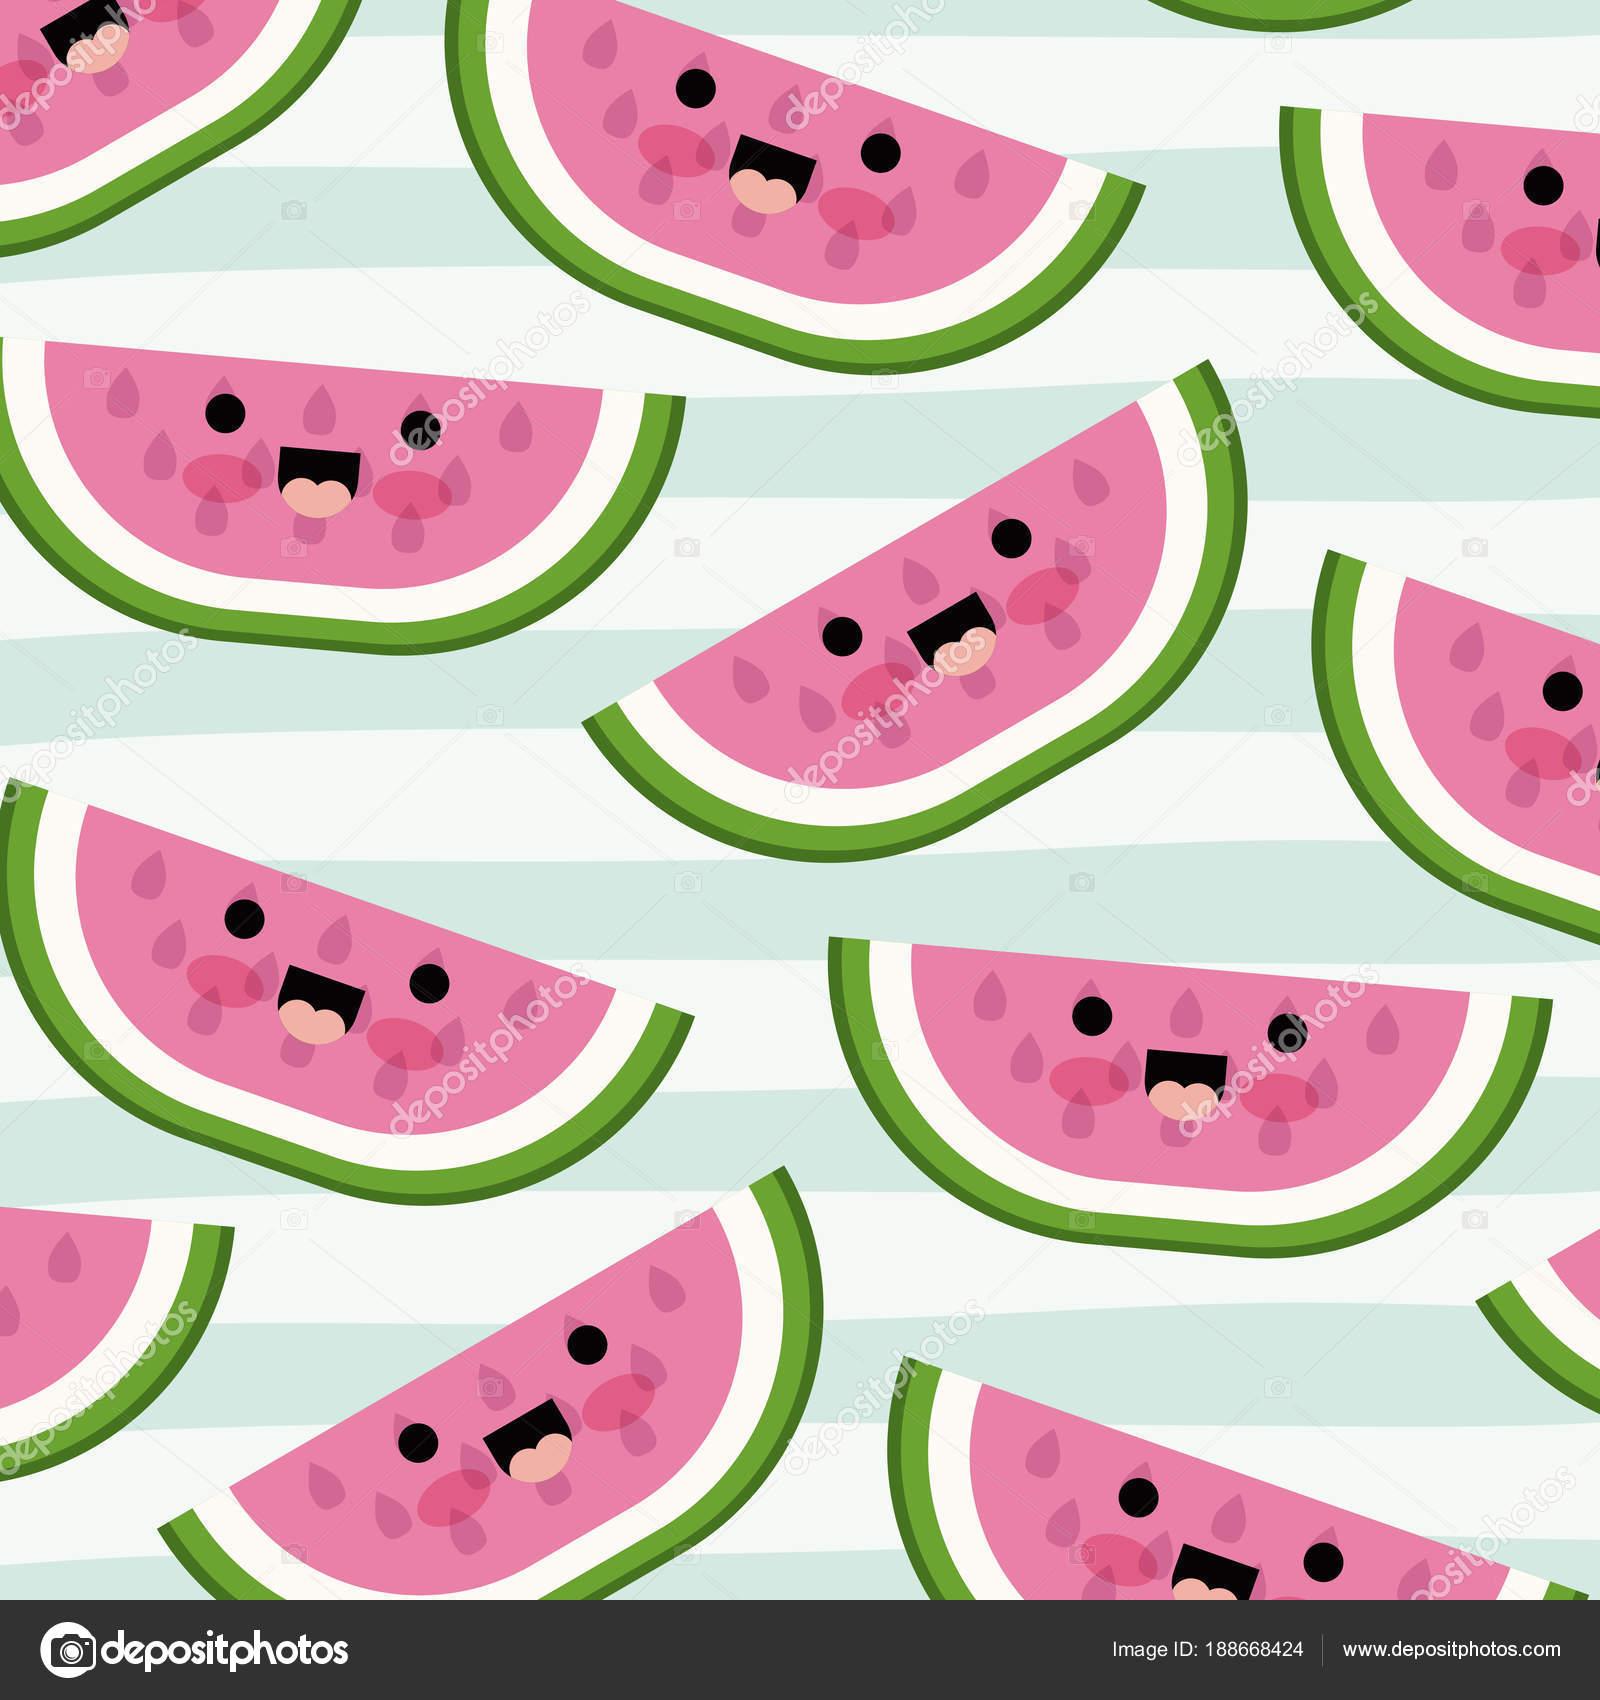 watermelon slice kawaii fruits pattern set on decorative lines color